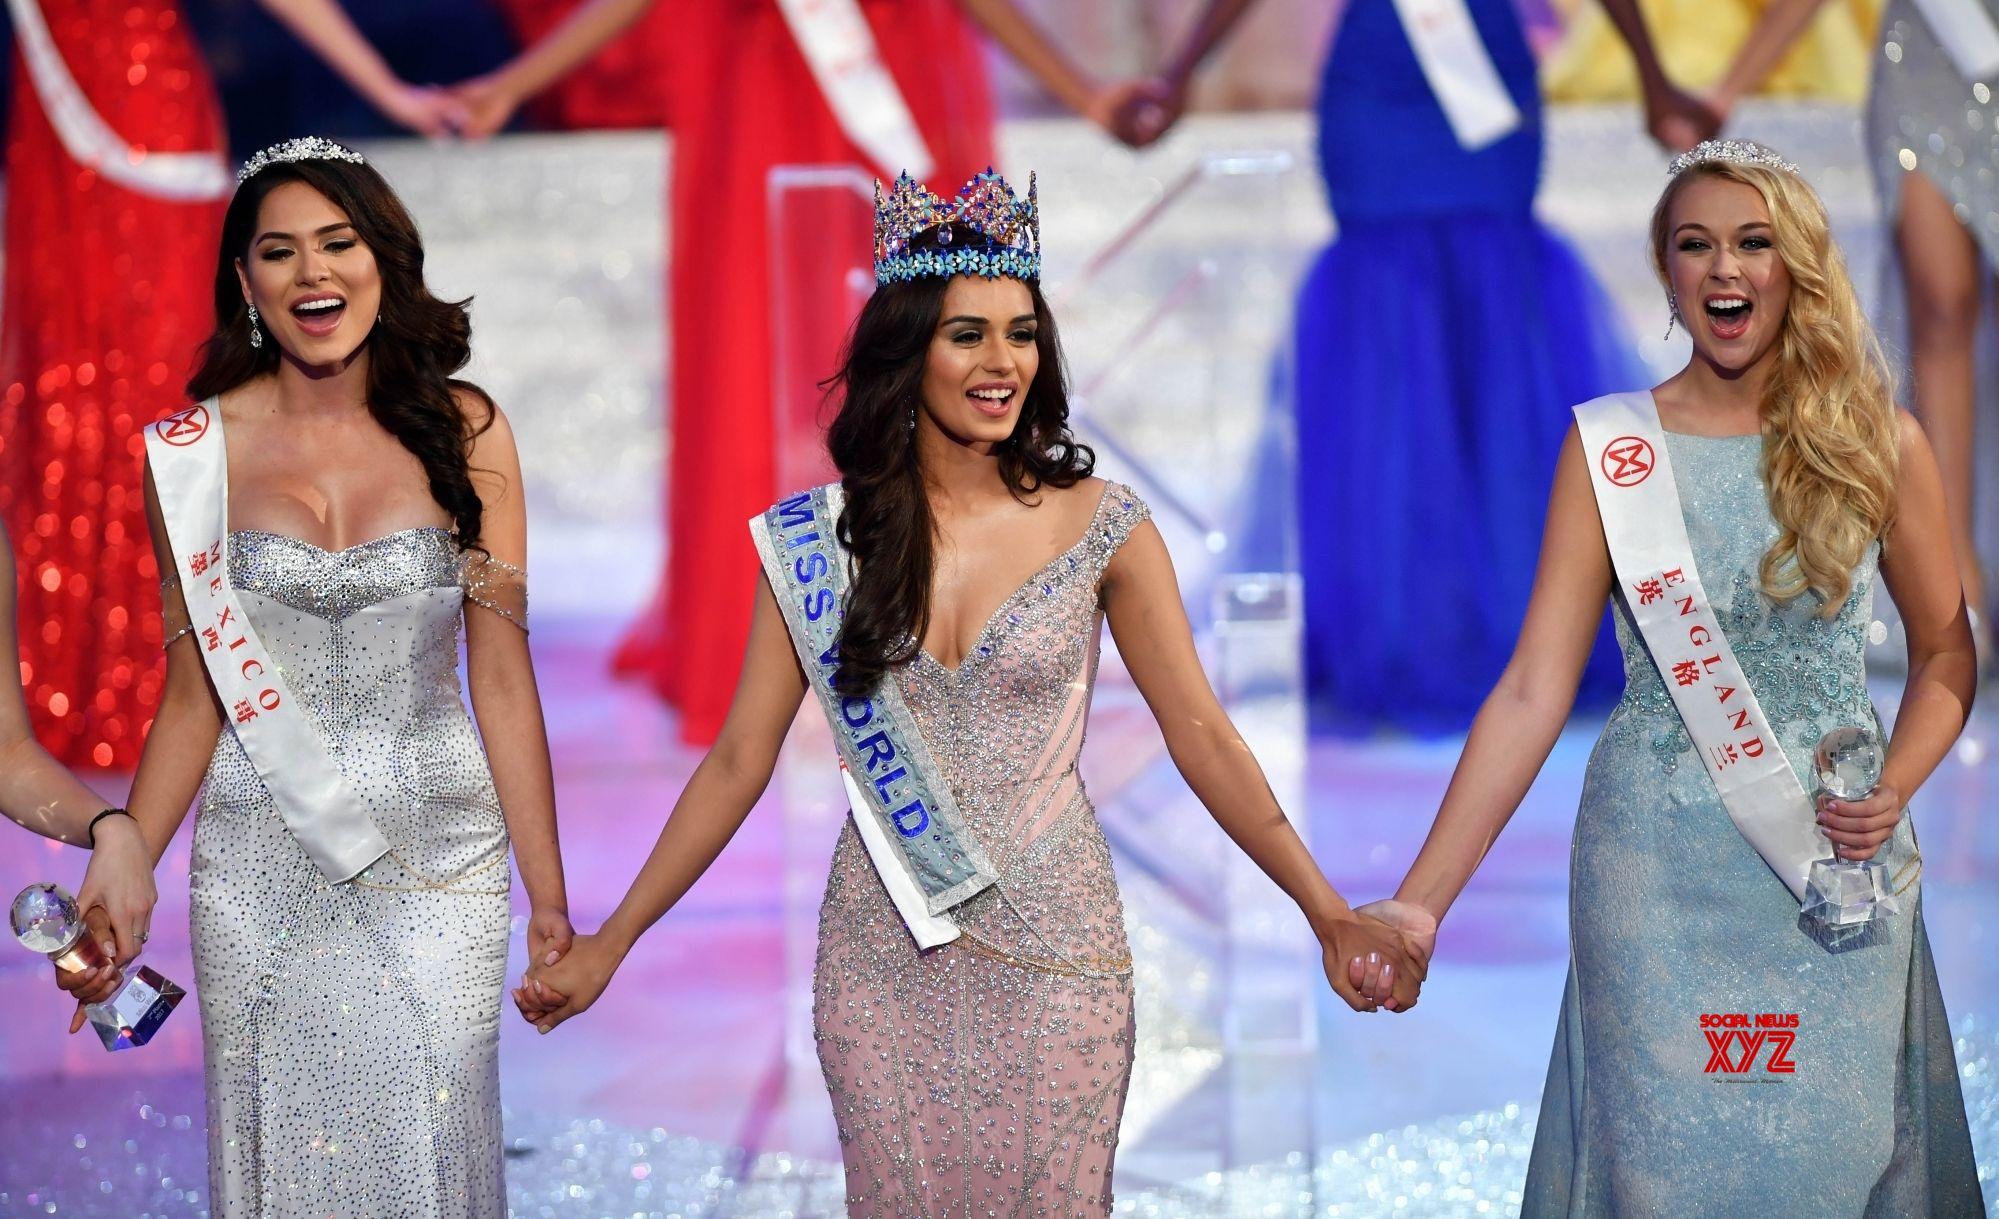 Date Of Miss Universe 2017 >> Sanya (China): India's Manushi Chillar wins Miss World crown - Social News XYZ